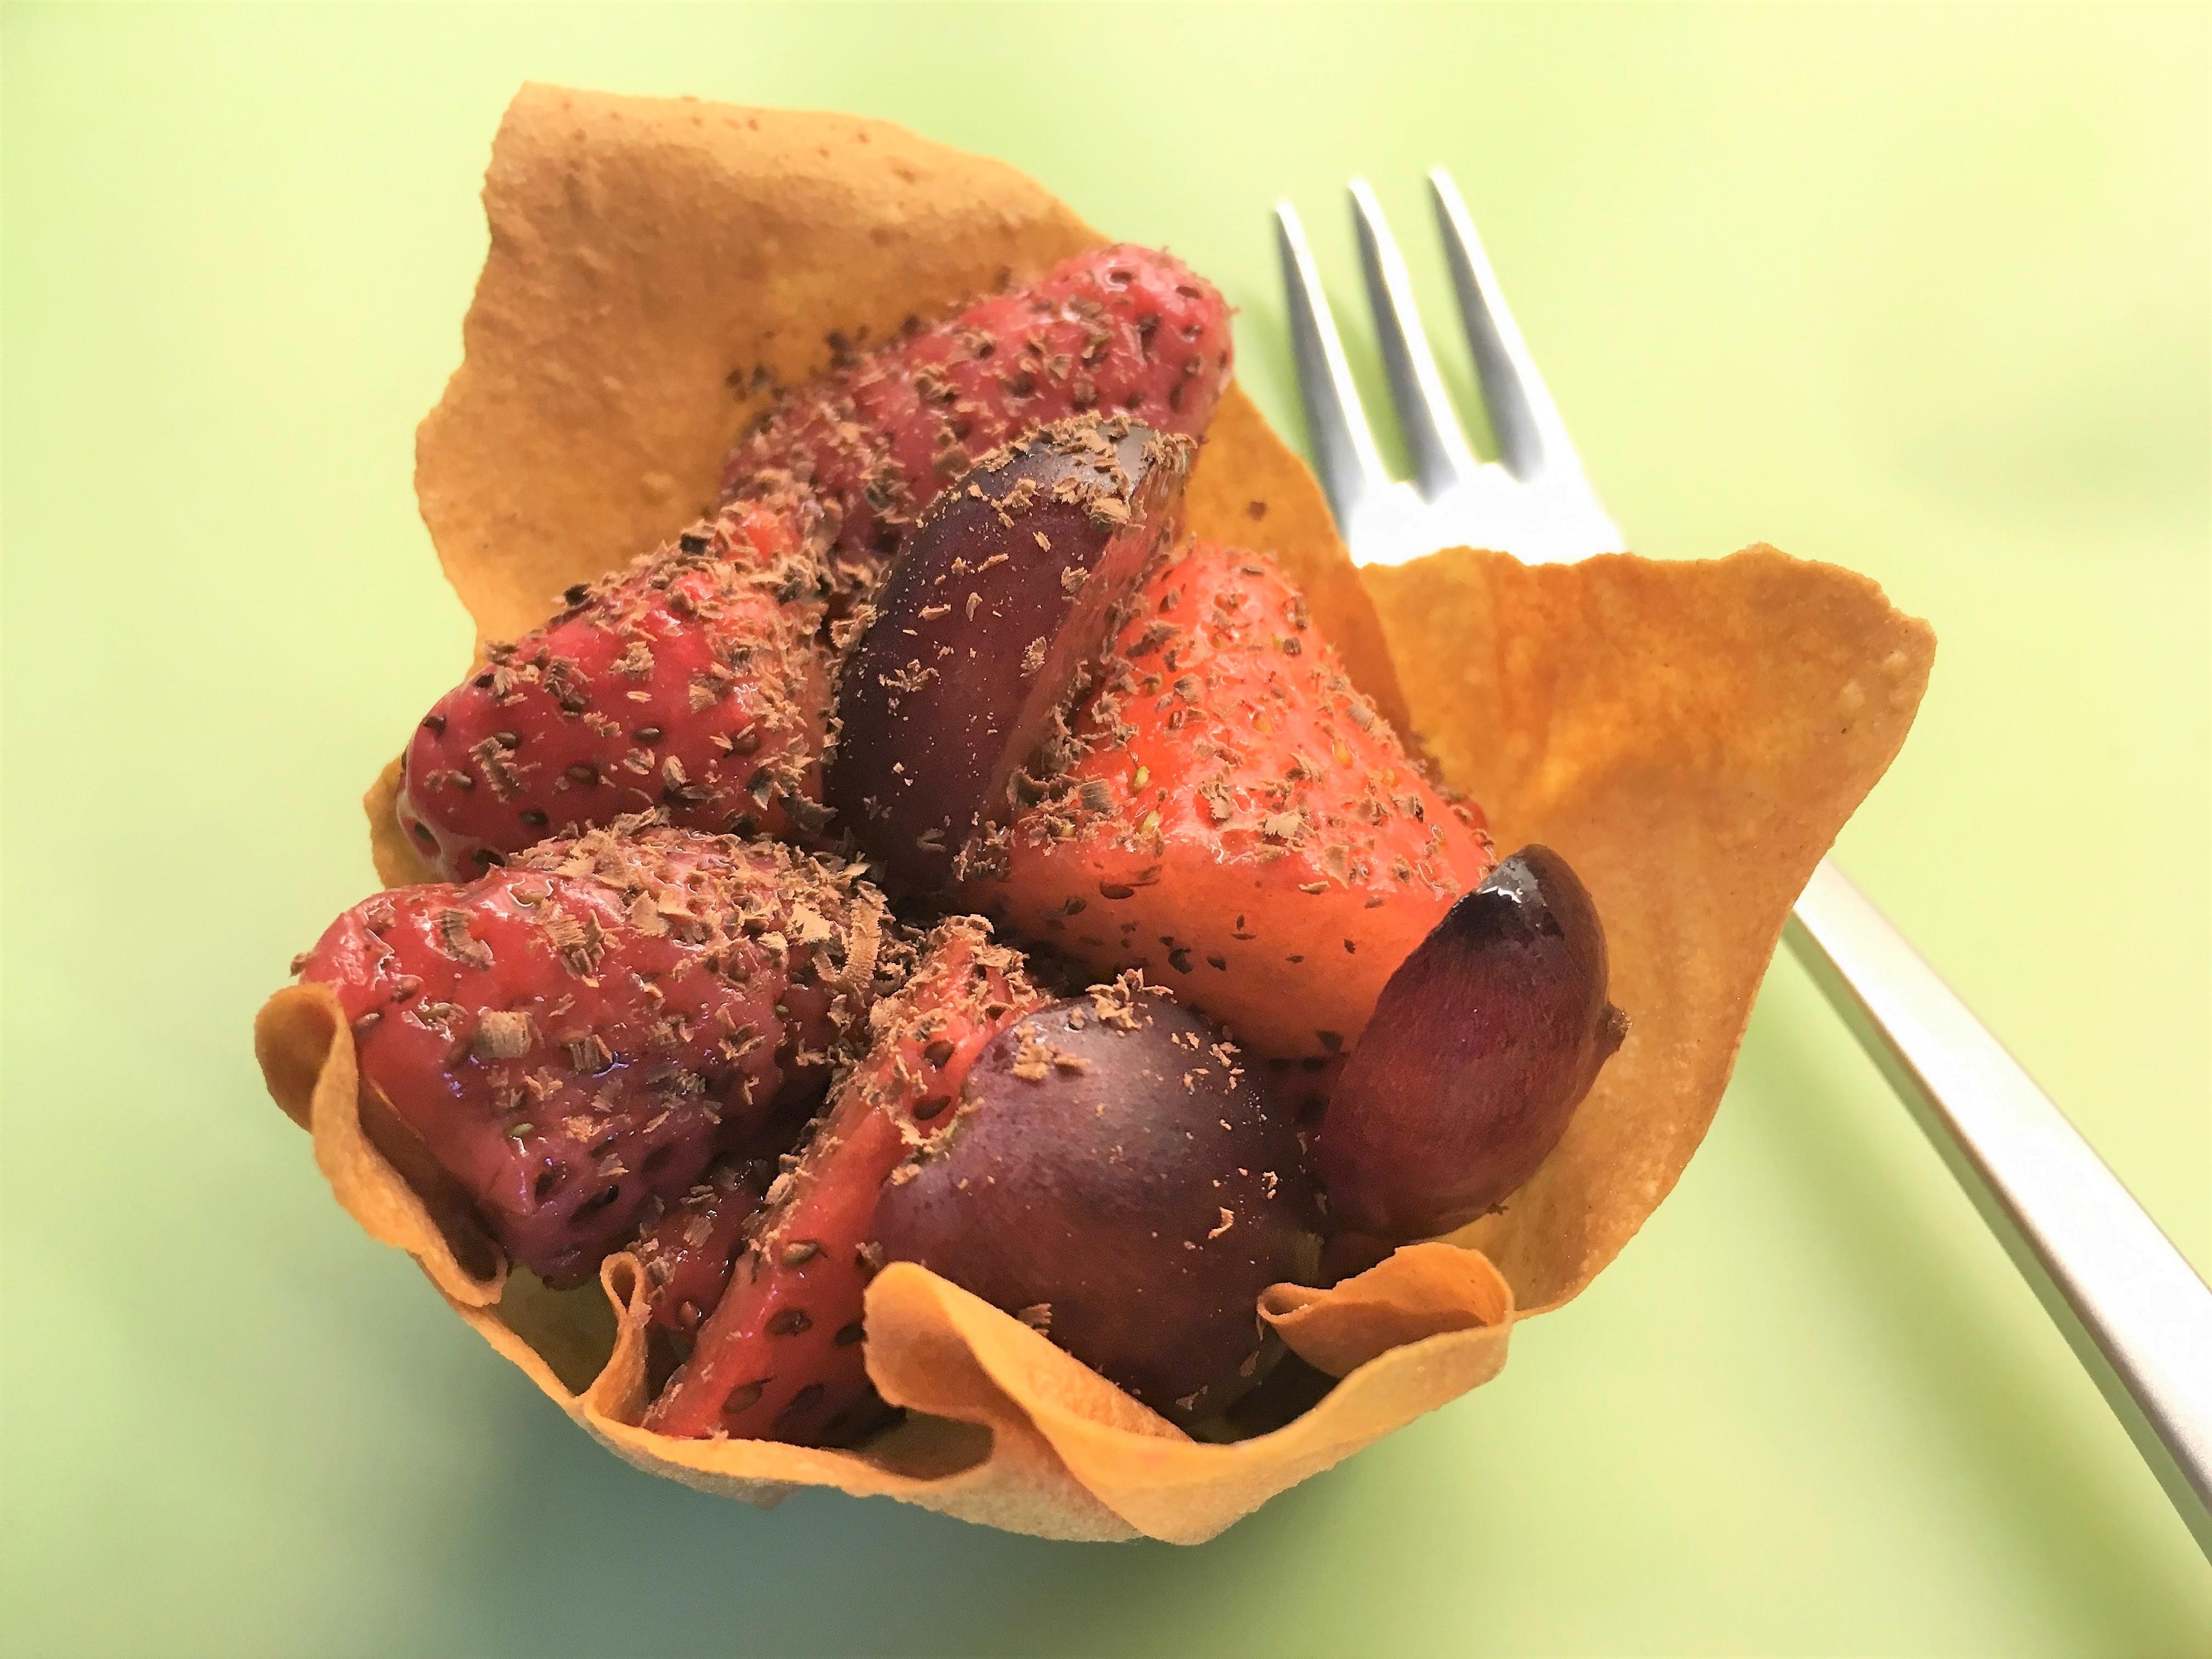 Filodej, jordbær, vindruer, opskrift, superotium, sundt, chokolade, sukkerfri, fedtfattig, dessert, gæster